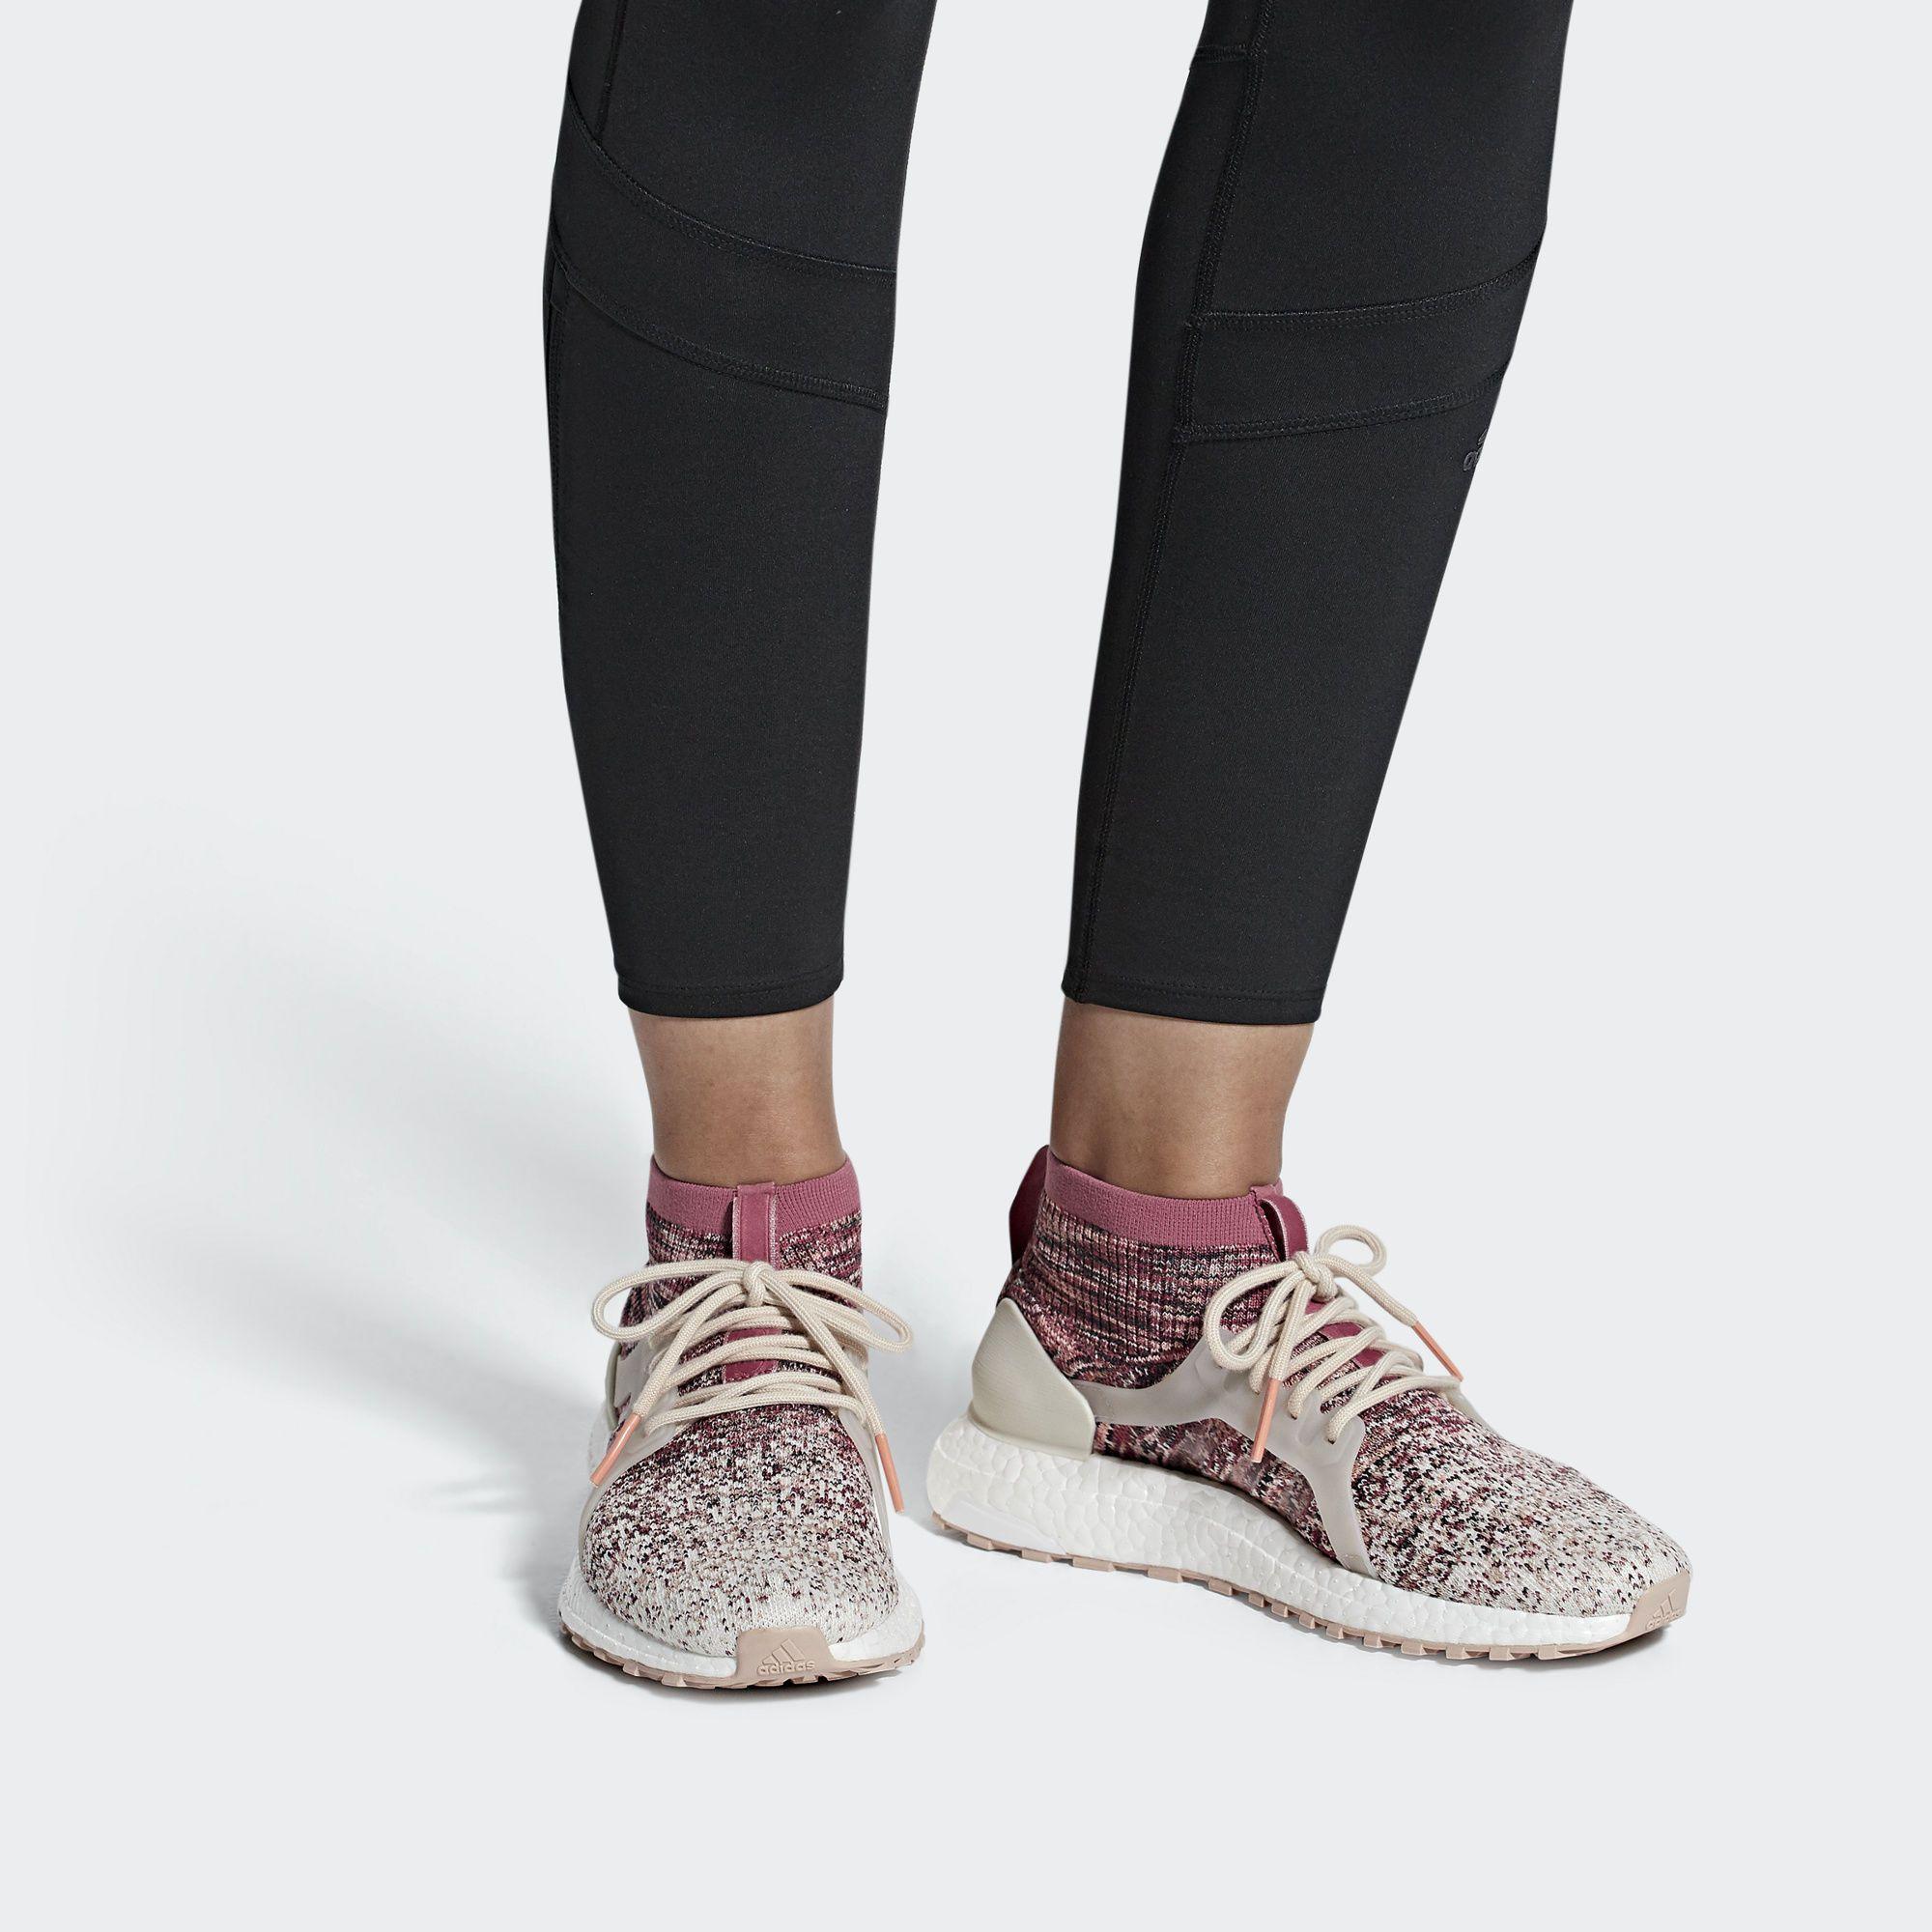 4fab08de1fcf00 Compra Sapatos Ultraboost X All Terrain LTD - Bege em adidas.co.uk ...